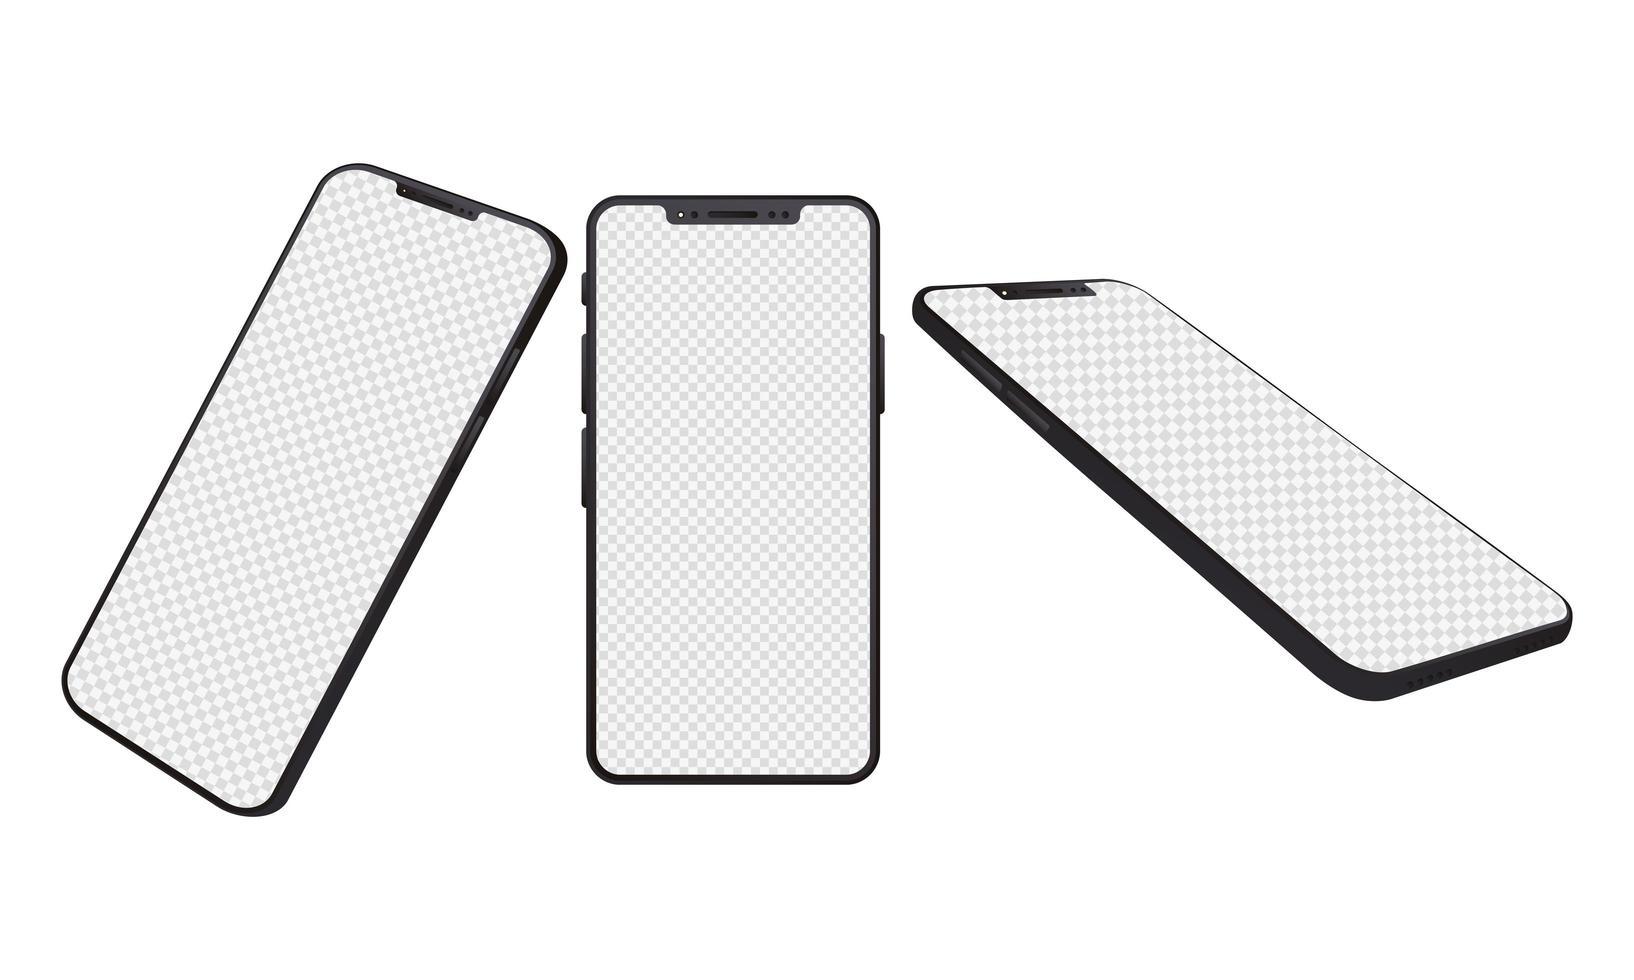 einfache Smartphone-Modellgeräte vektor